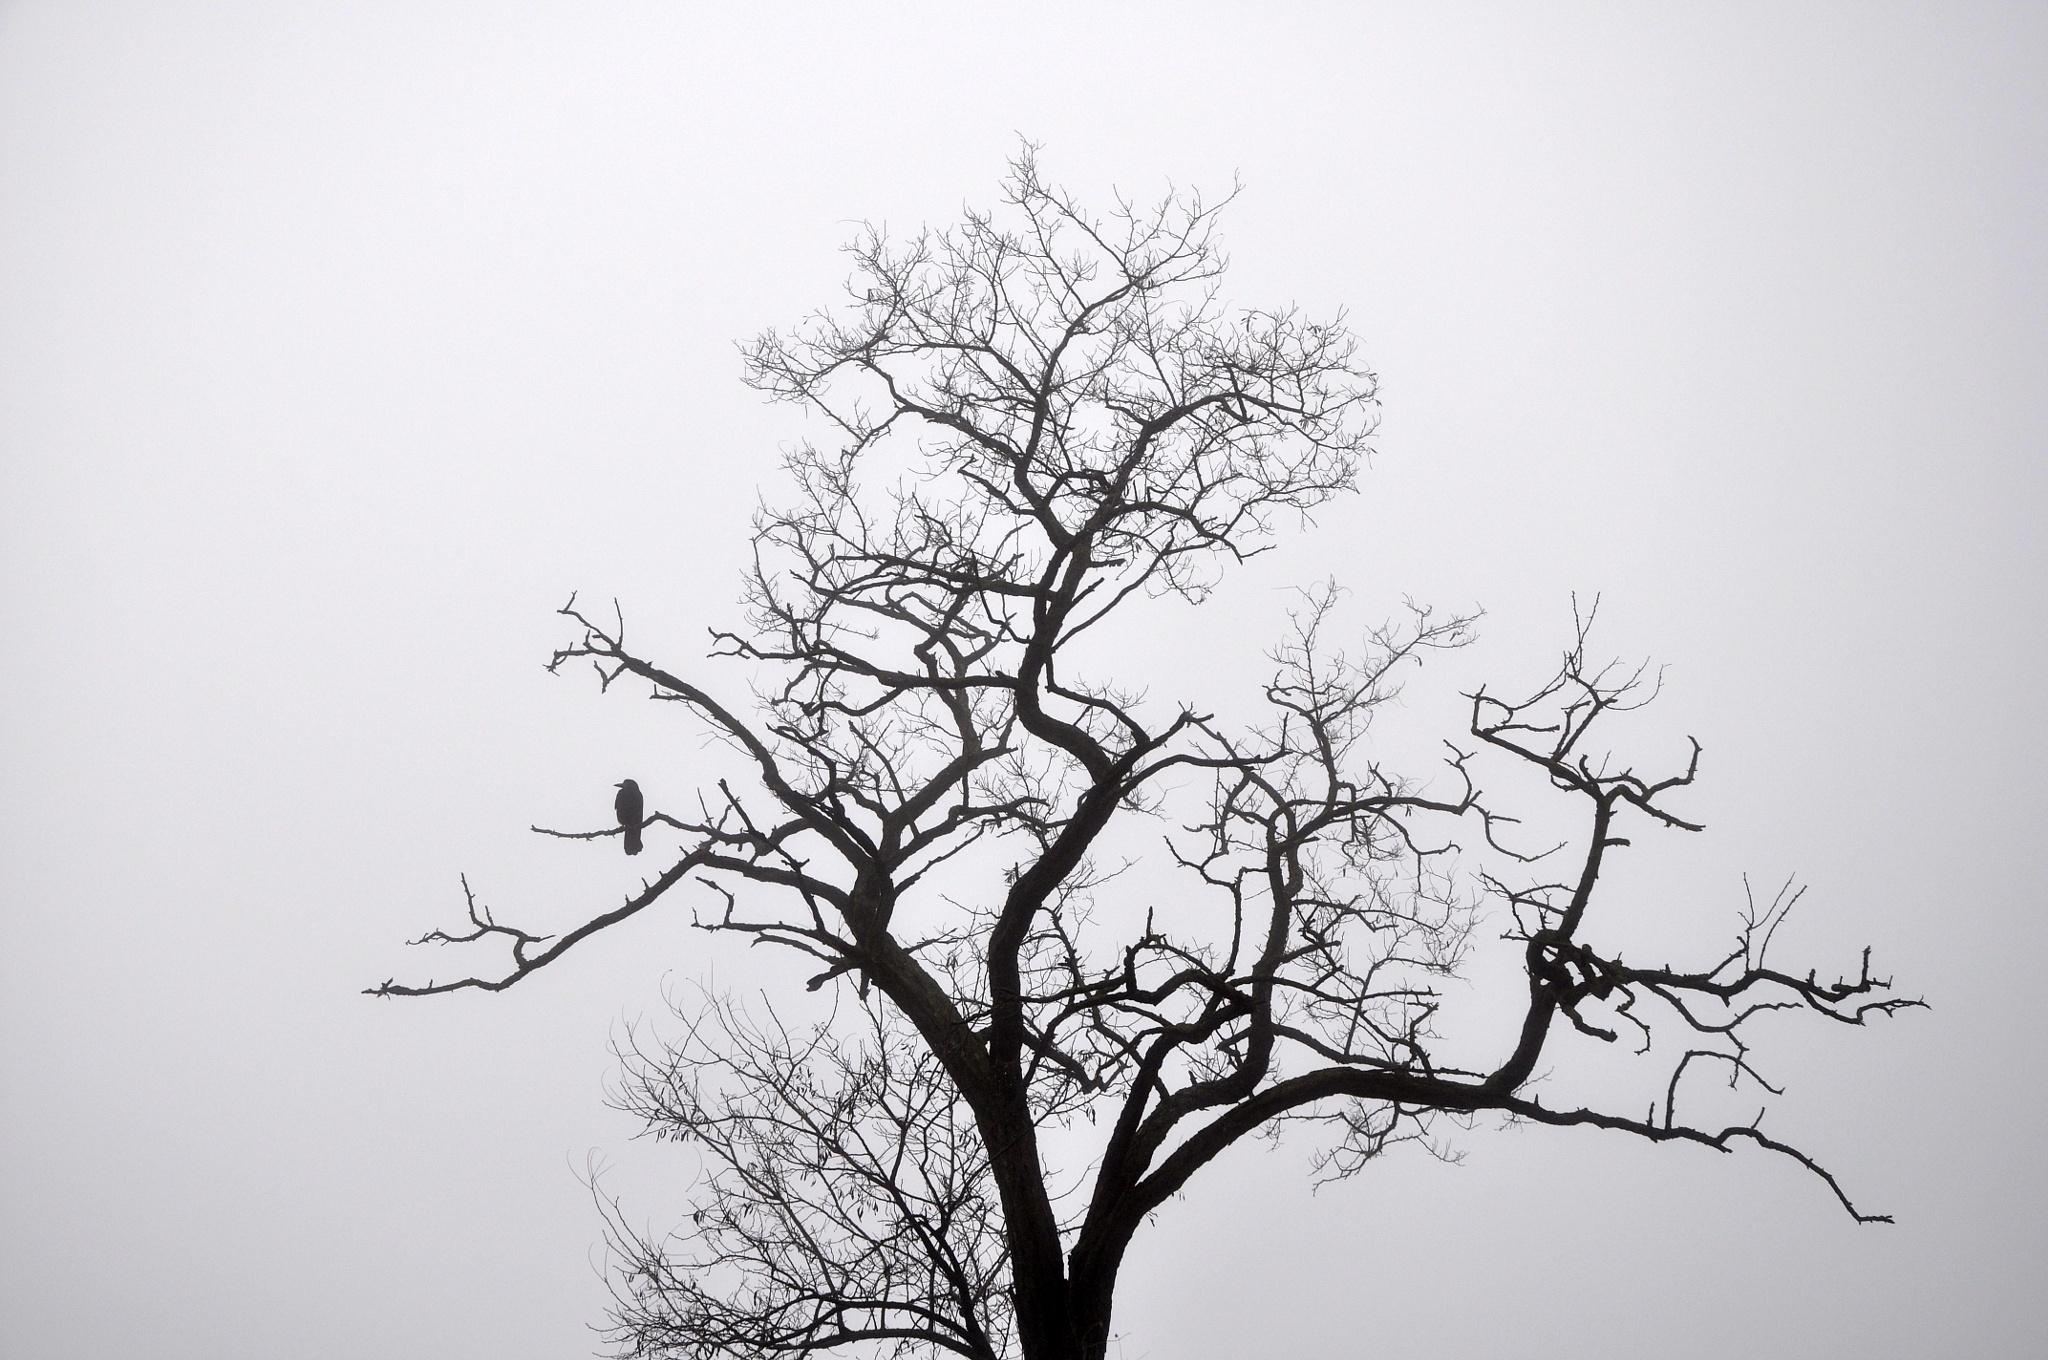 The Lonely Crow by Branislava Brandic